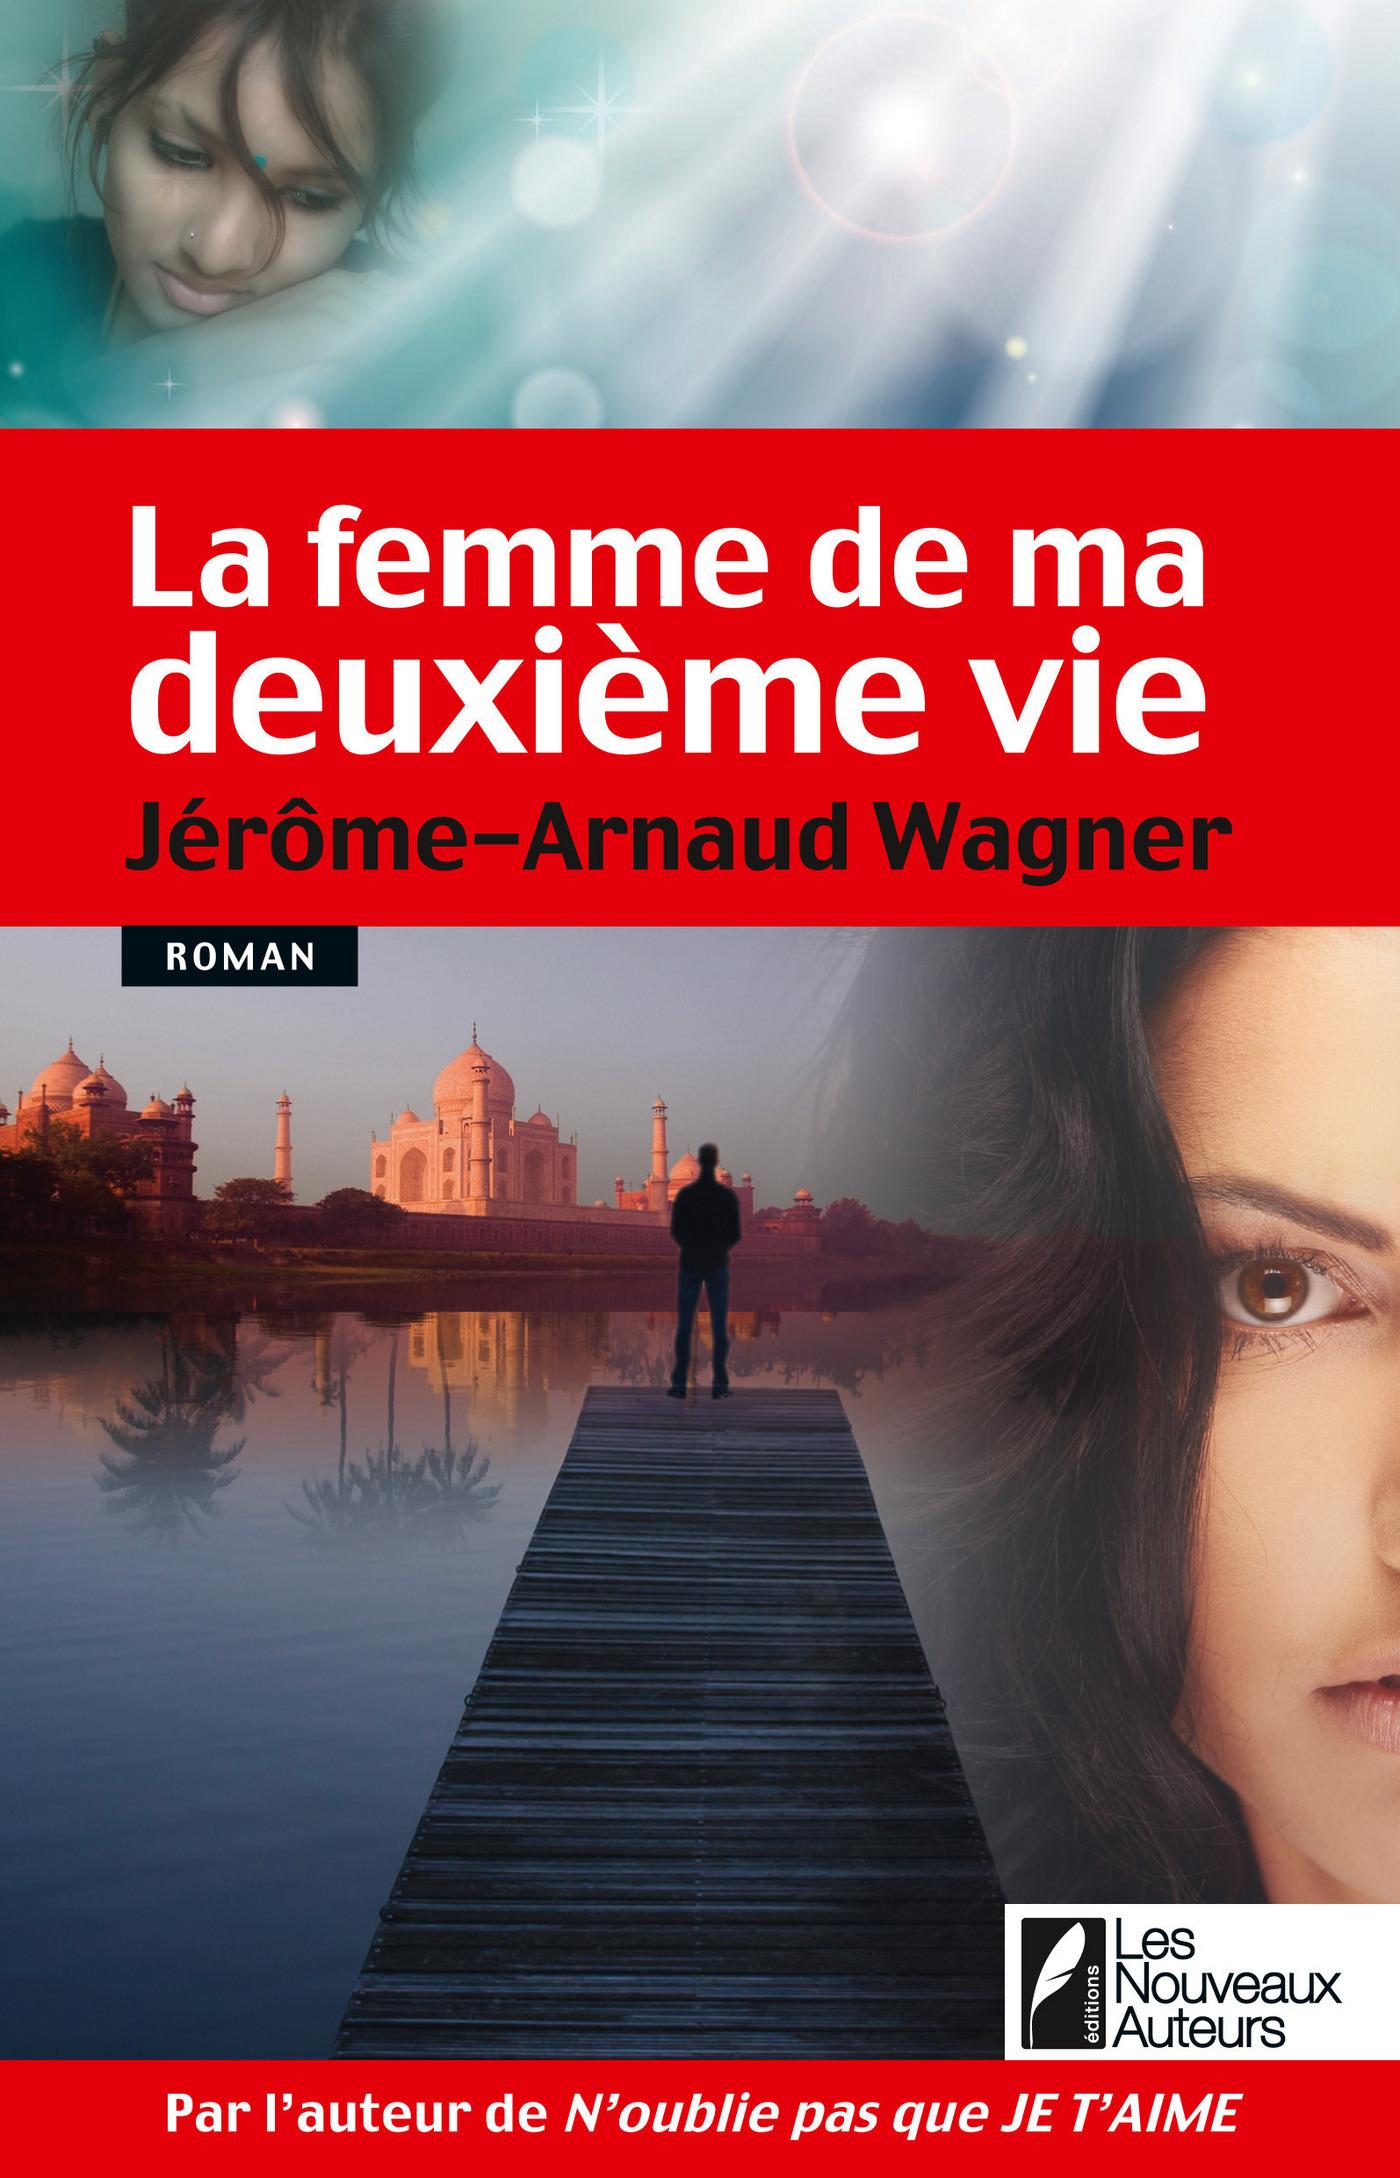 La femme de ma deuxième vie (ebook)